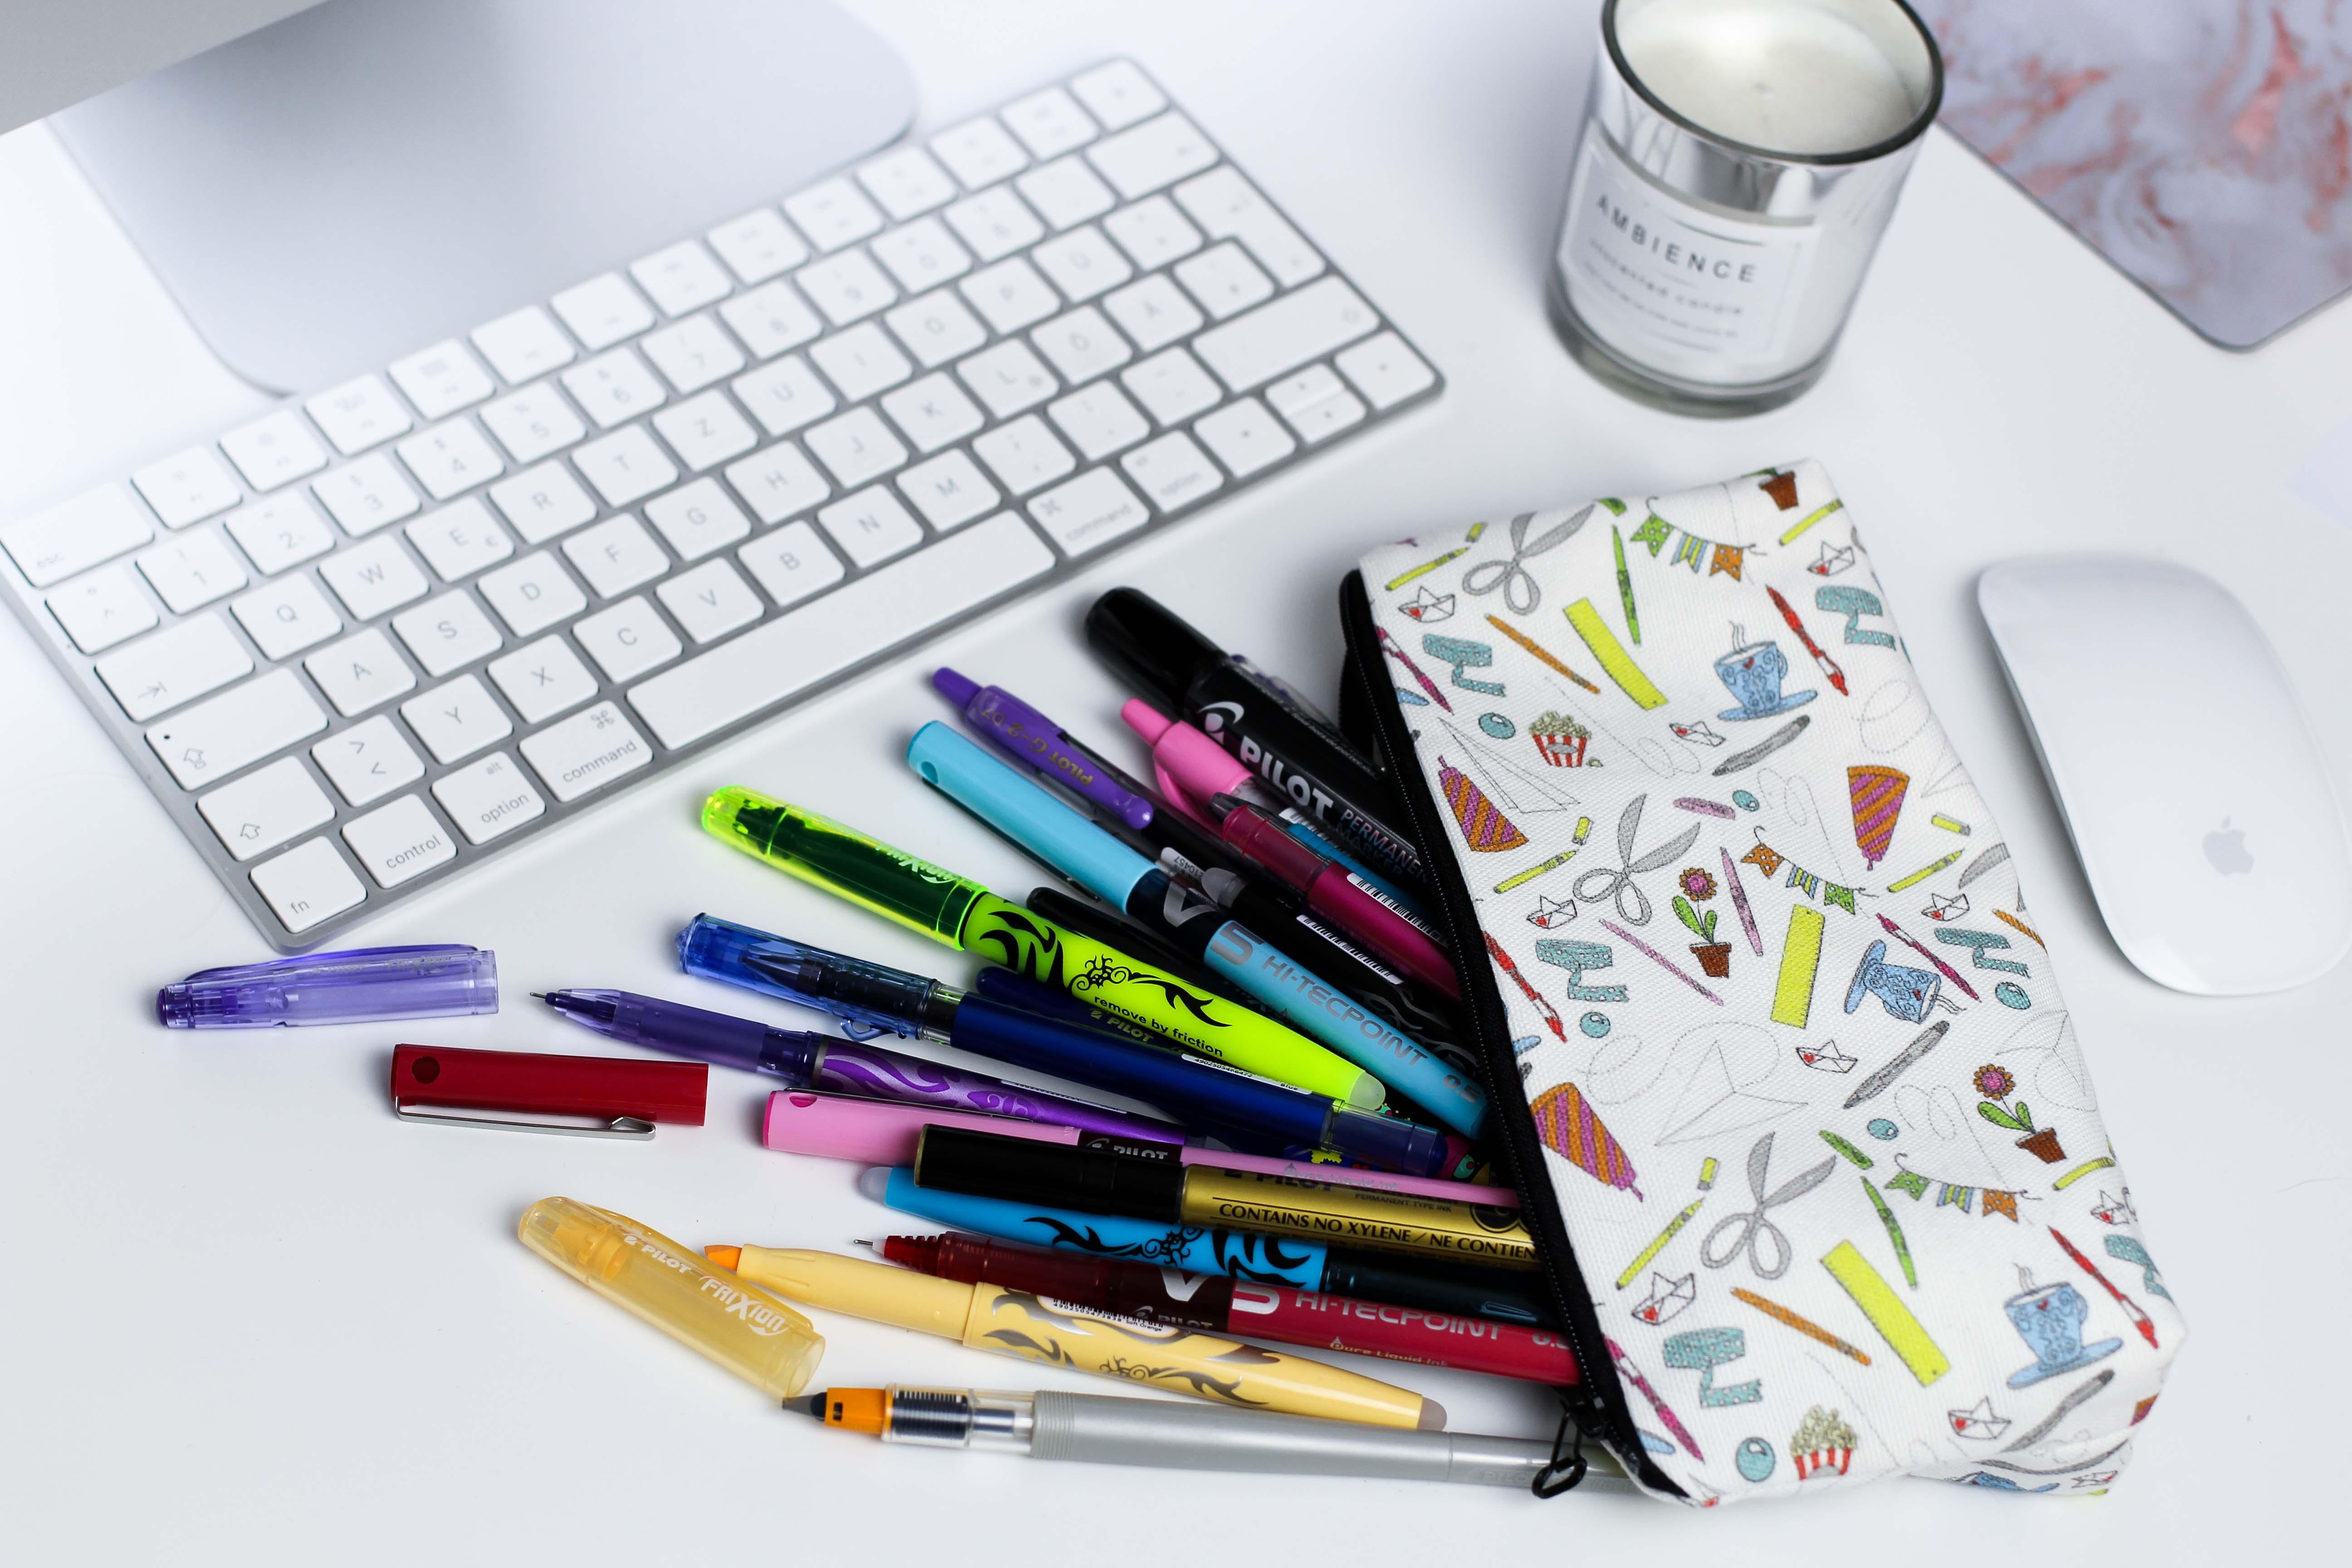 Blogger Adventskalender Mäppchen Stifte Pilot Pen Lettering Bleistift Textmarker Gelschreiber Blog Organizer kreativ